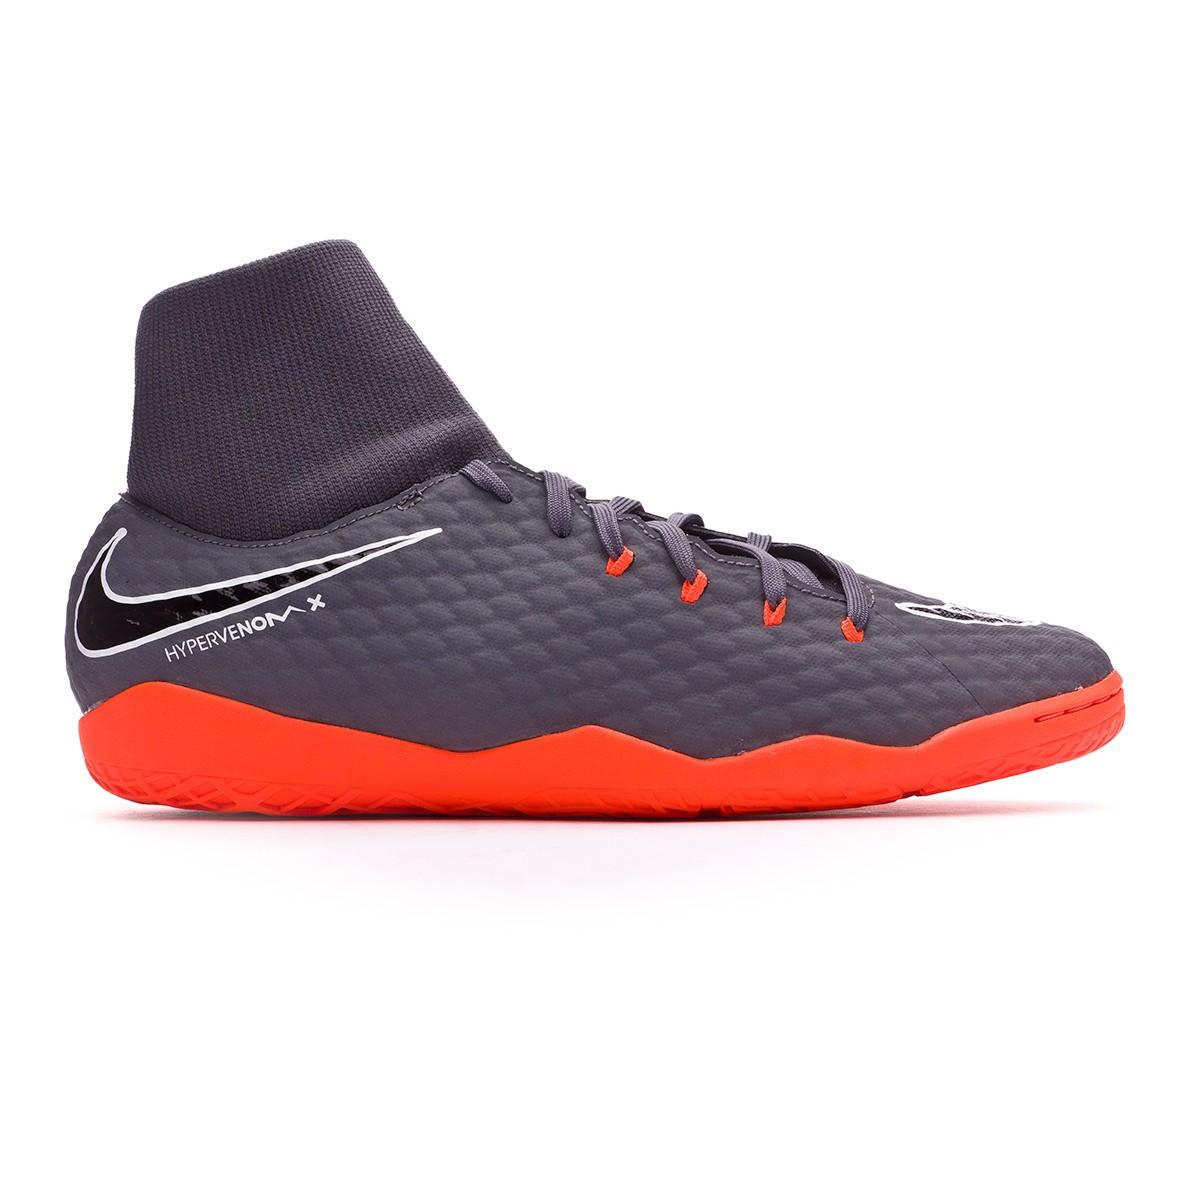 f0f86a7ccc8 Tenis Nike Hypervenom PhantomX III Academy DF IC Dark grey-Total  orange-White - Tienda de fútbol Fútbol Emotion